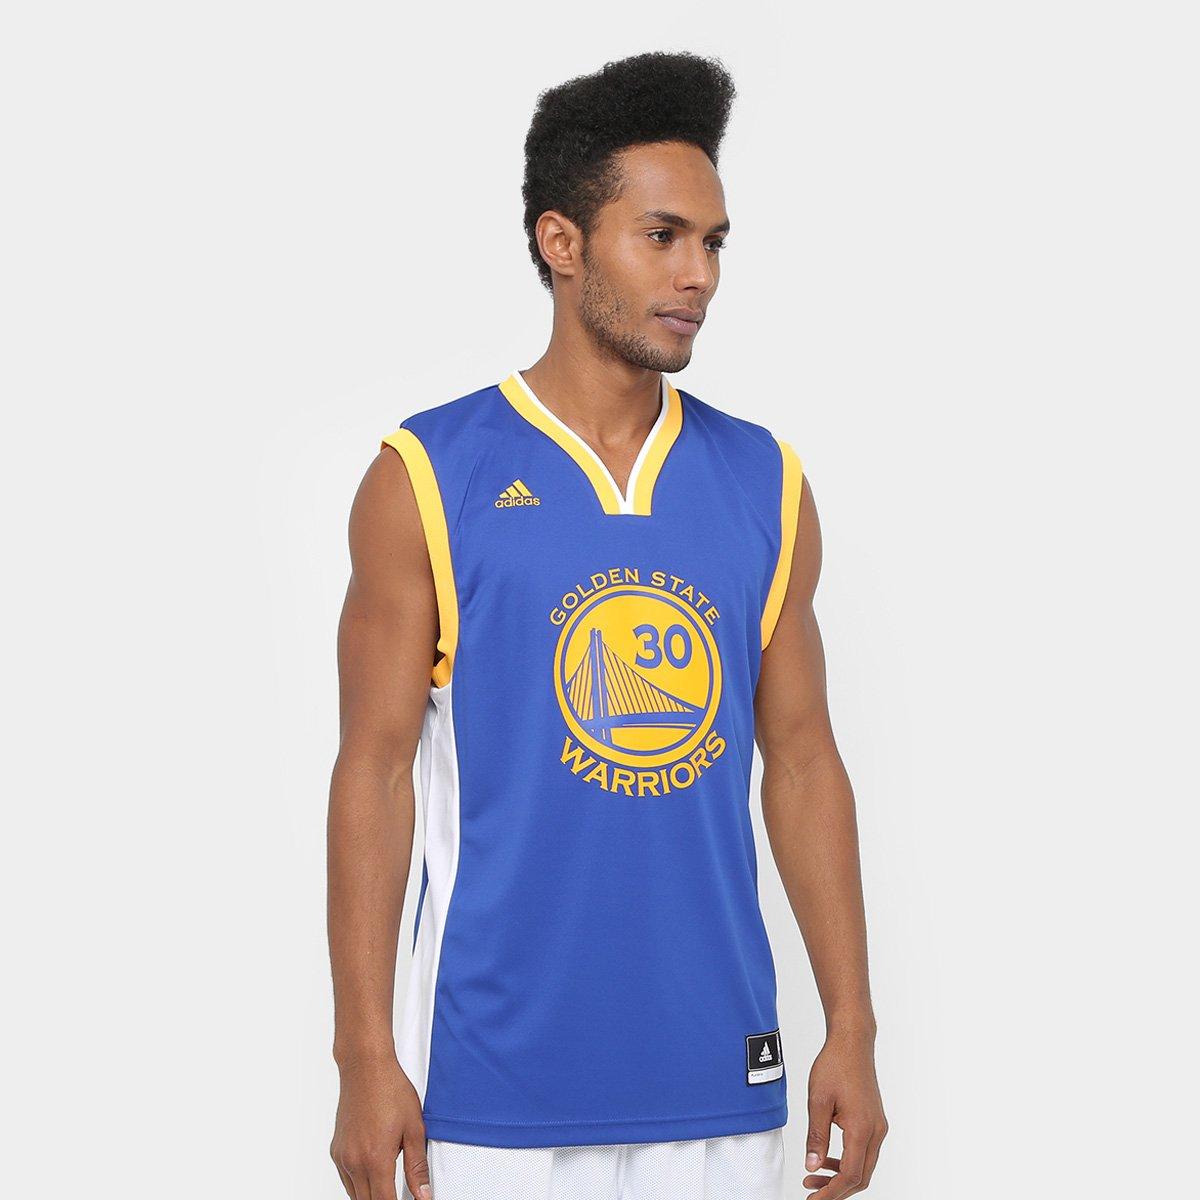 e2f139d14d Camiseta Regata Adidas NBA Golden State Warriors Curry